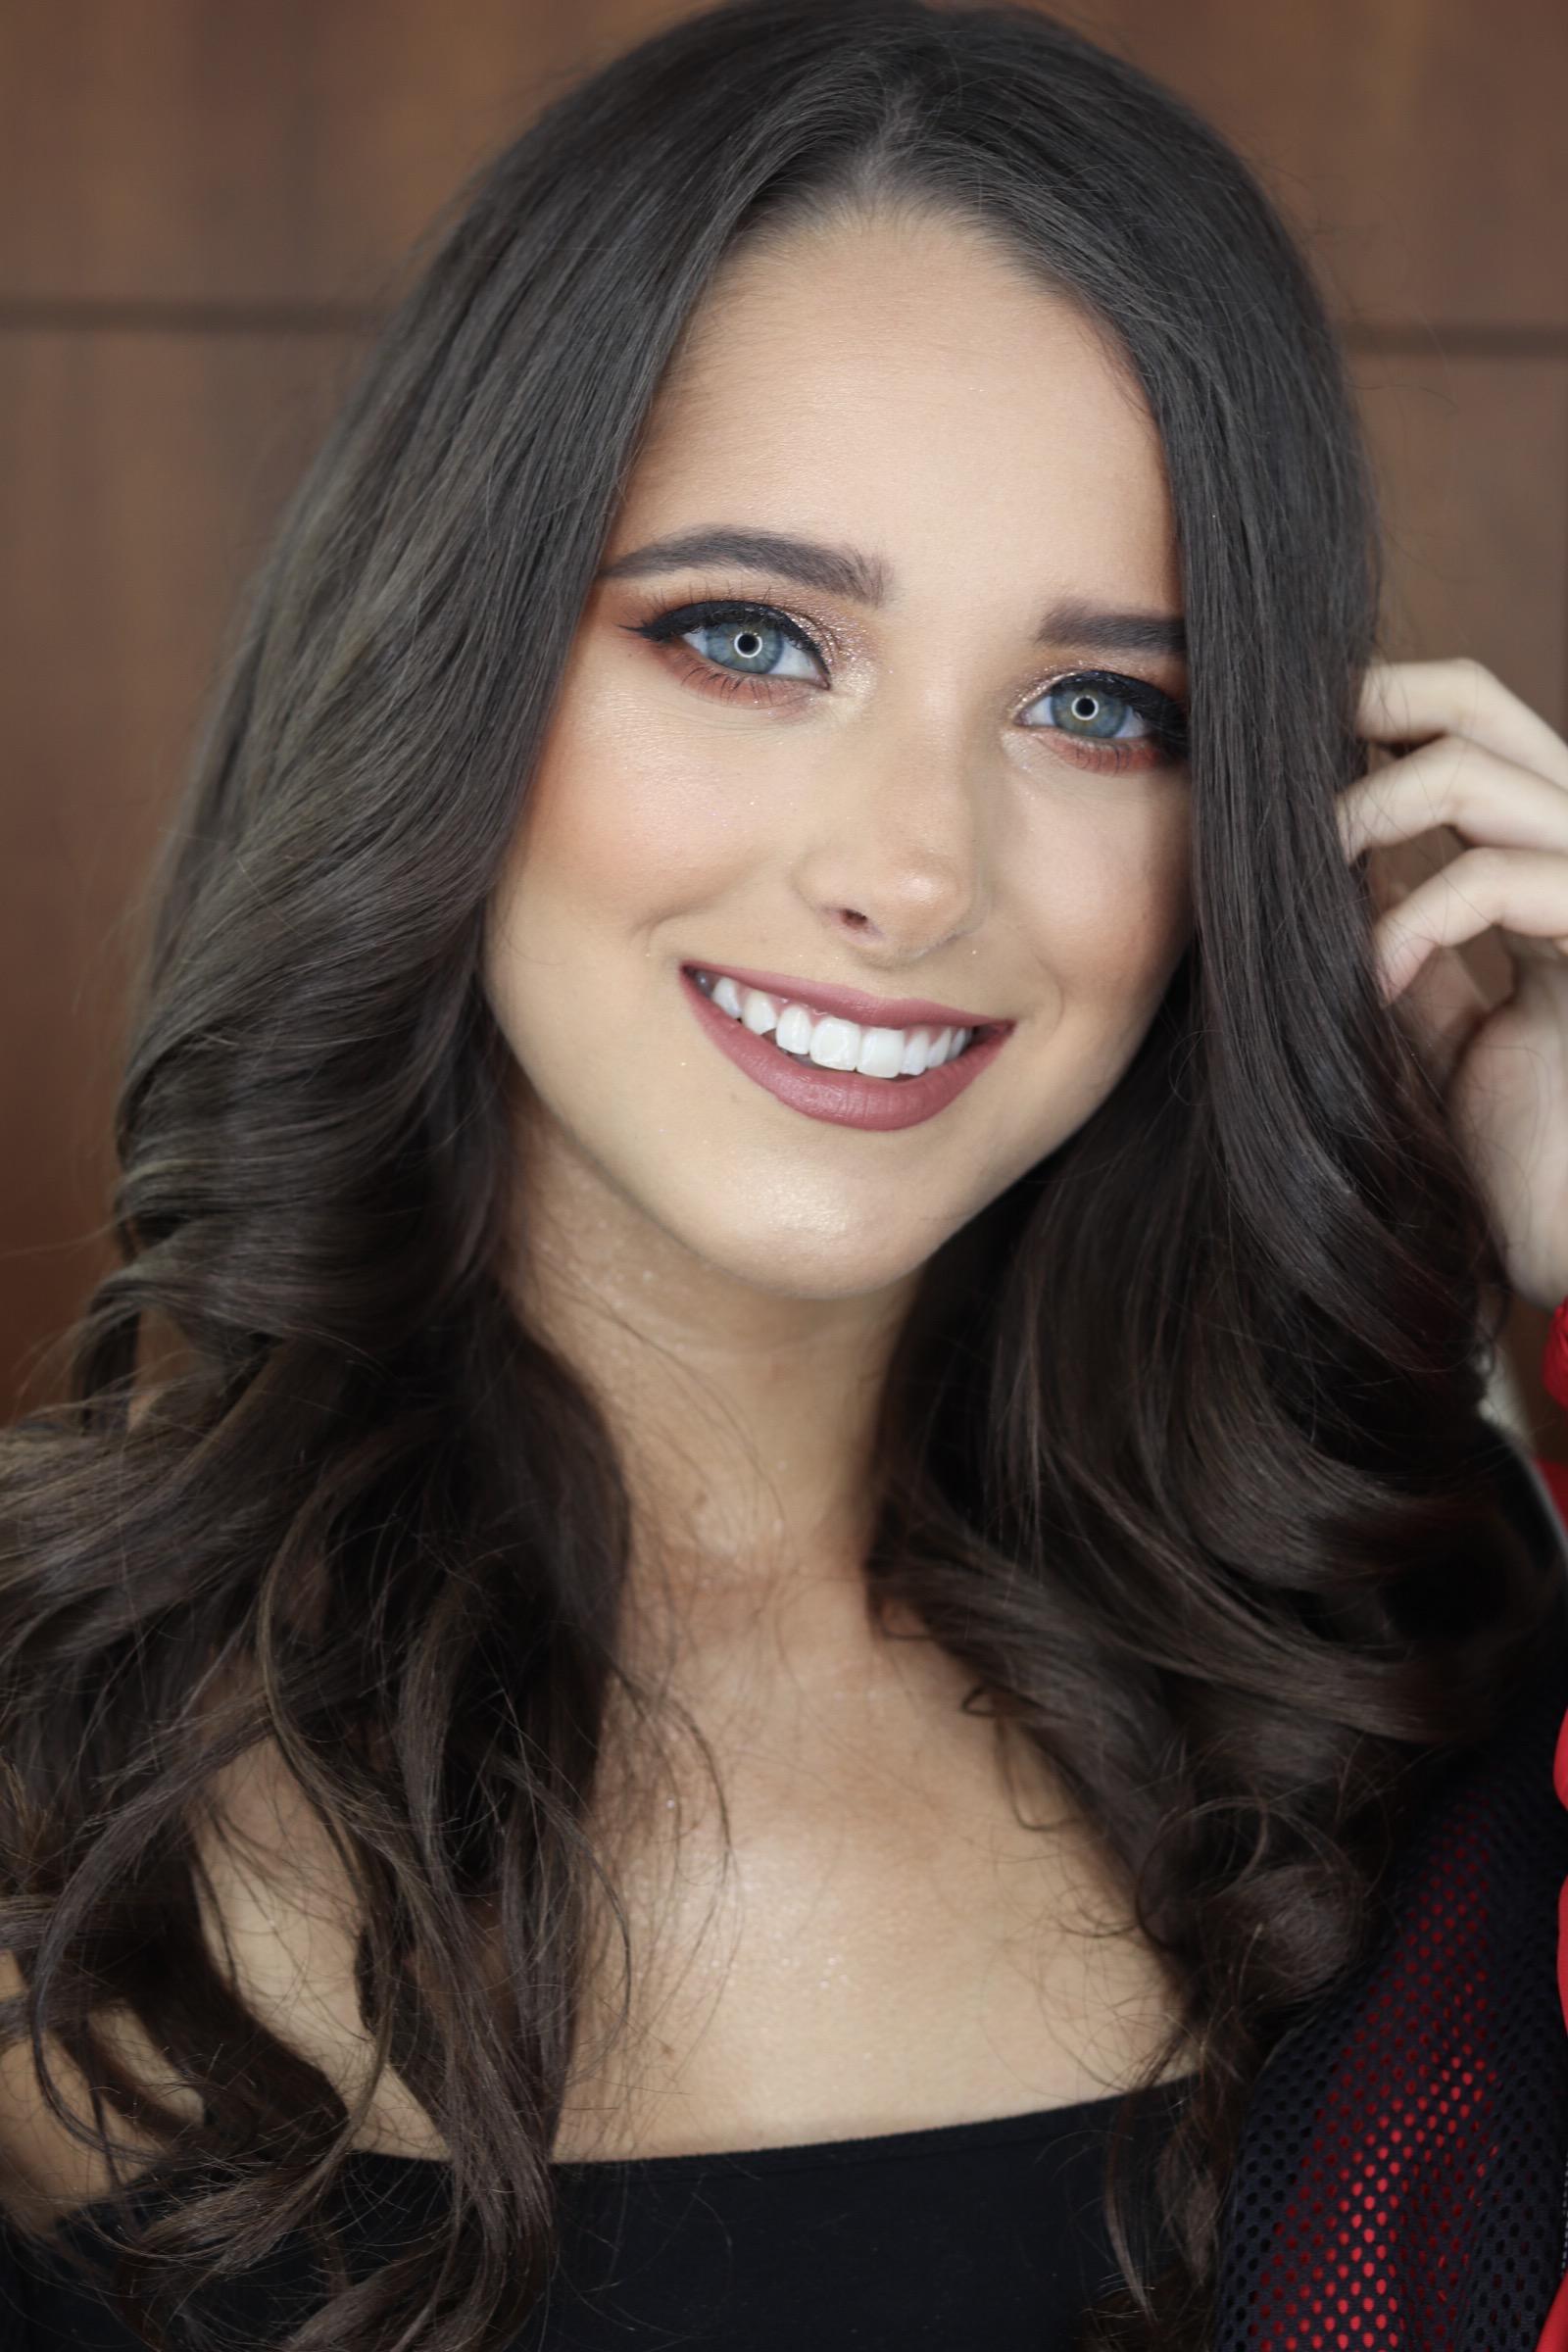 Michelle Olvera